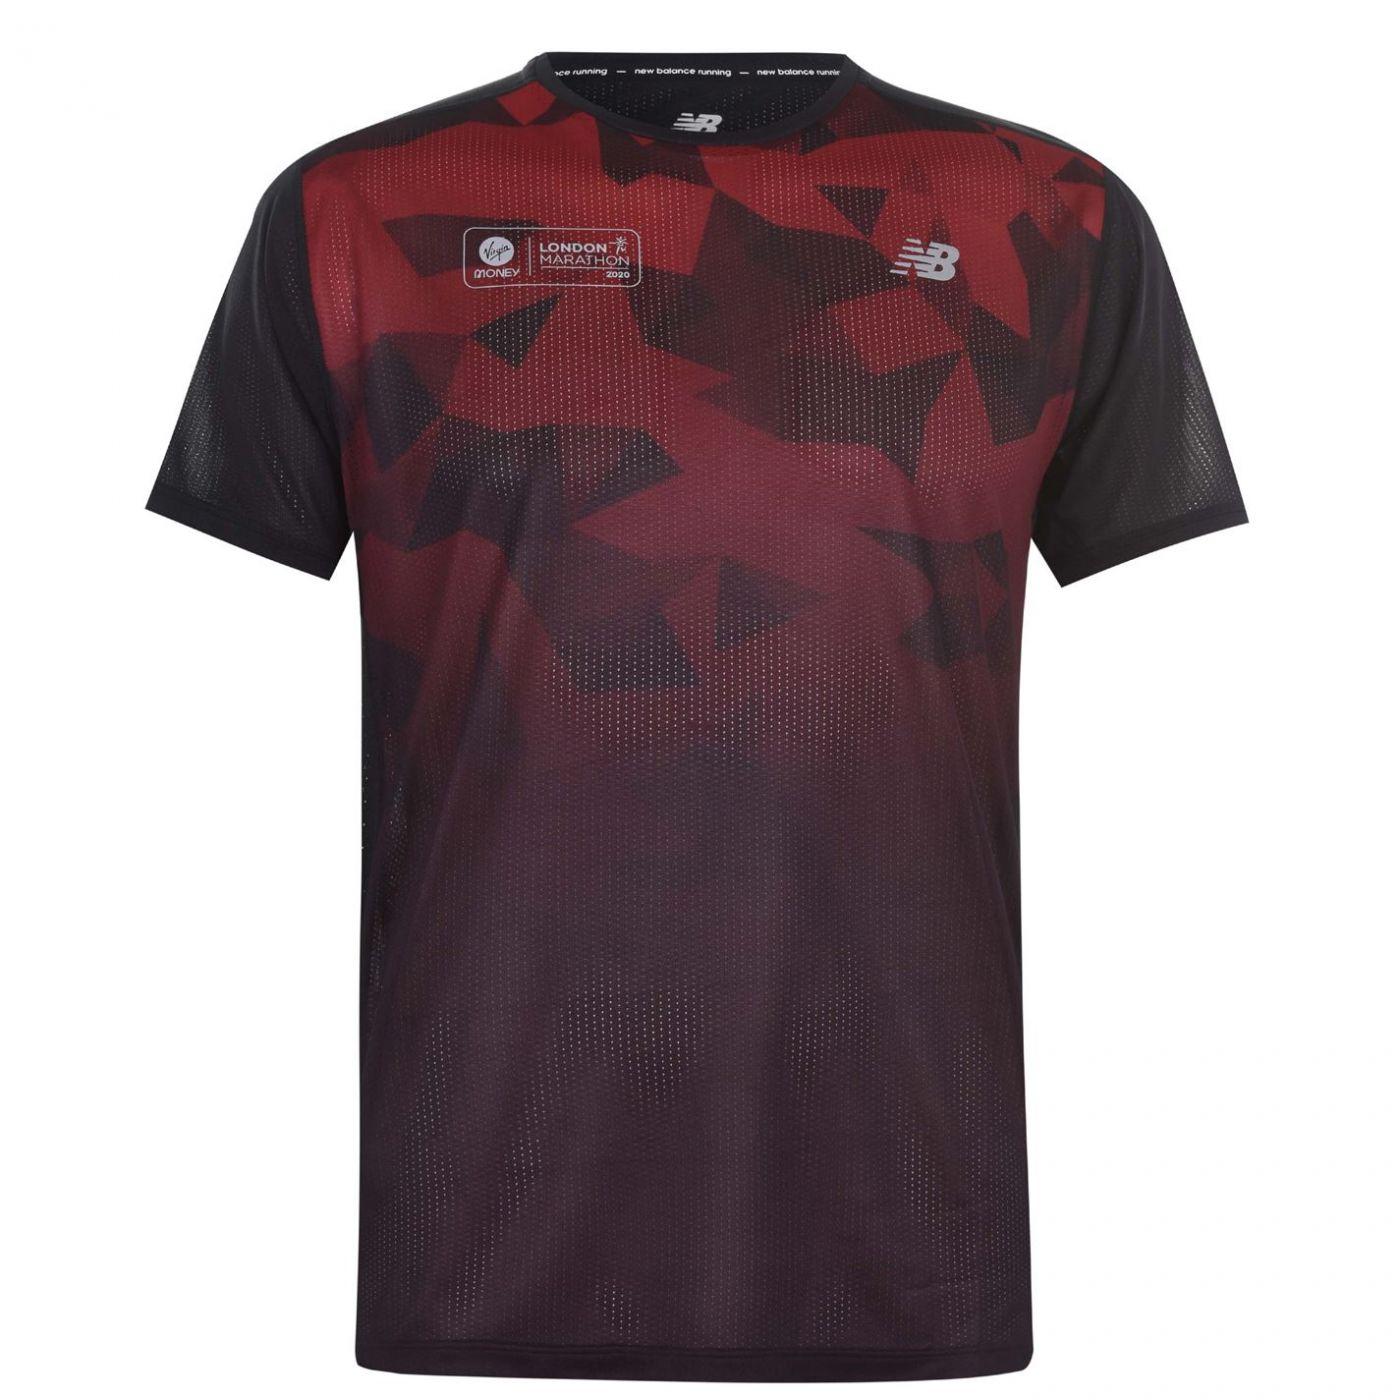 New Balance Virgin London Marathon T Shirt Mens